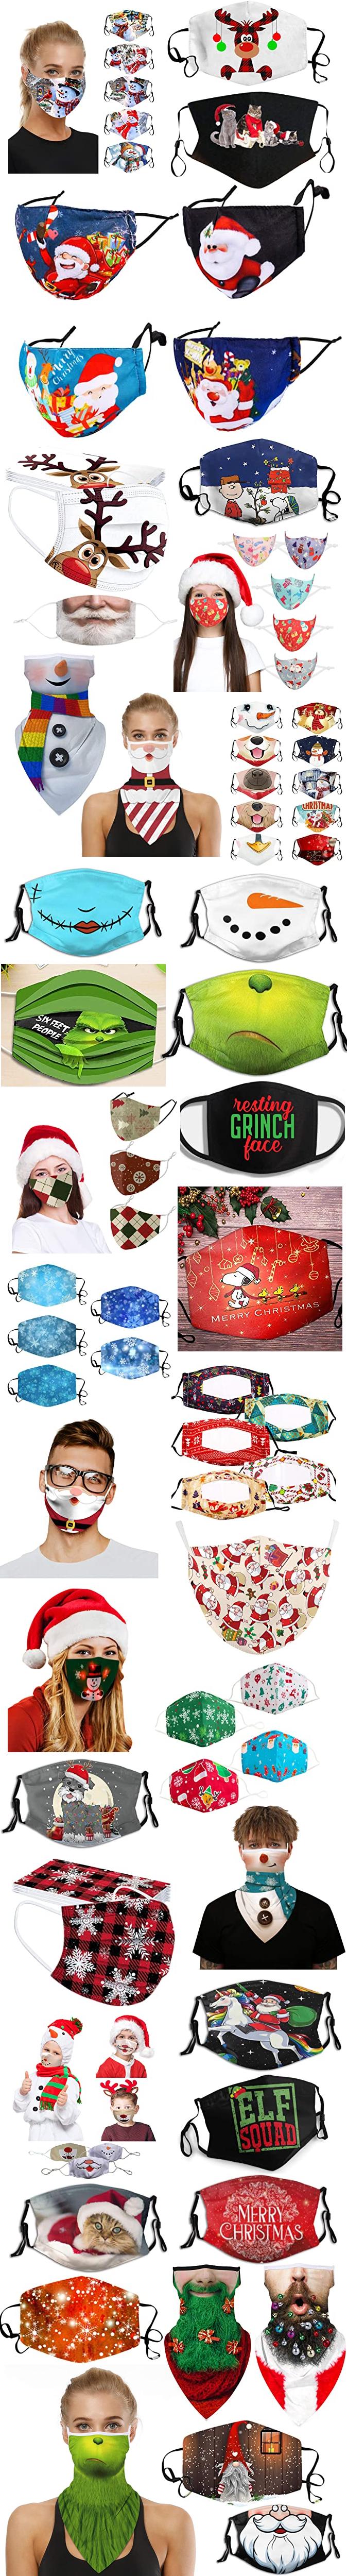 Funny-Christmas-Holiday-Face-Masks